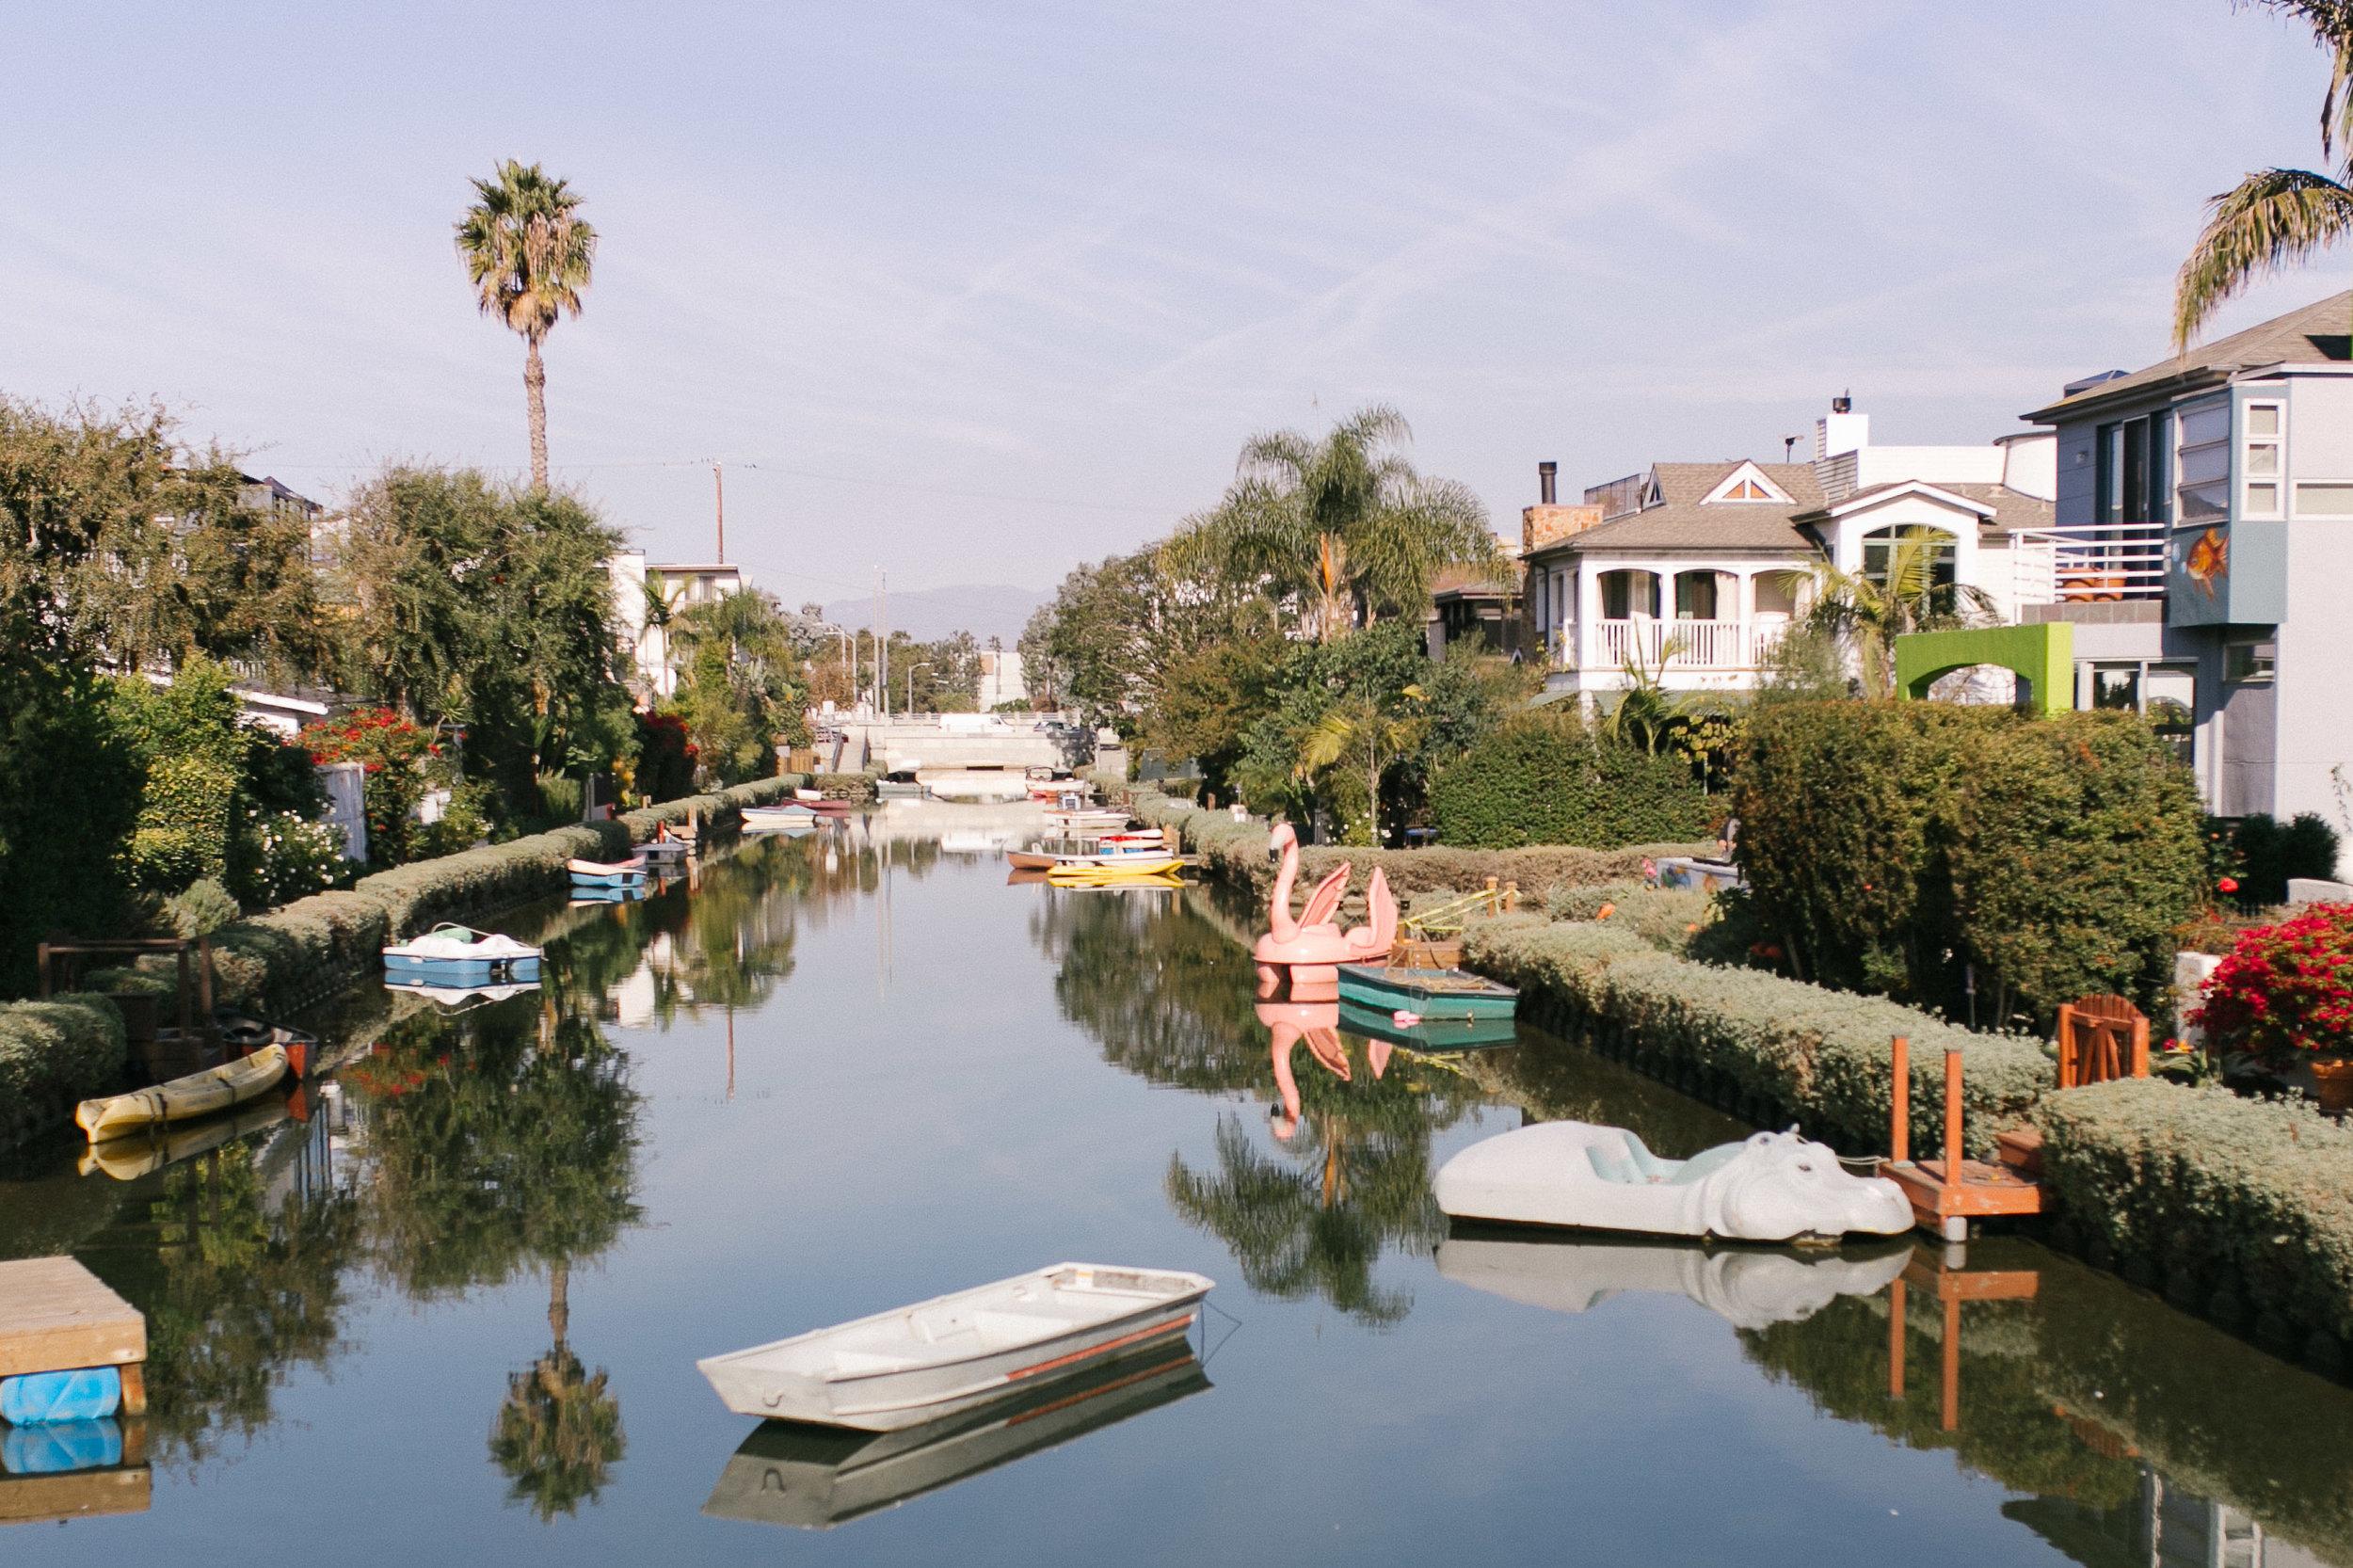 Taking Photos in LA Venice Beach CA | Chelsea Macor Photography-7.jpg